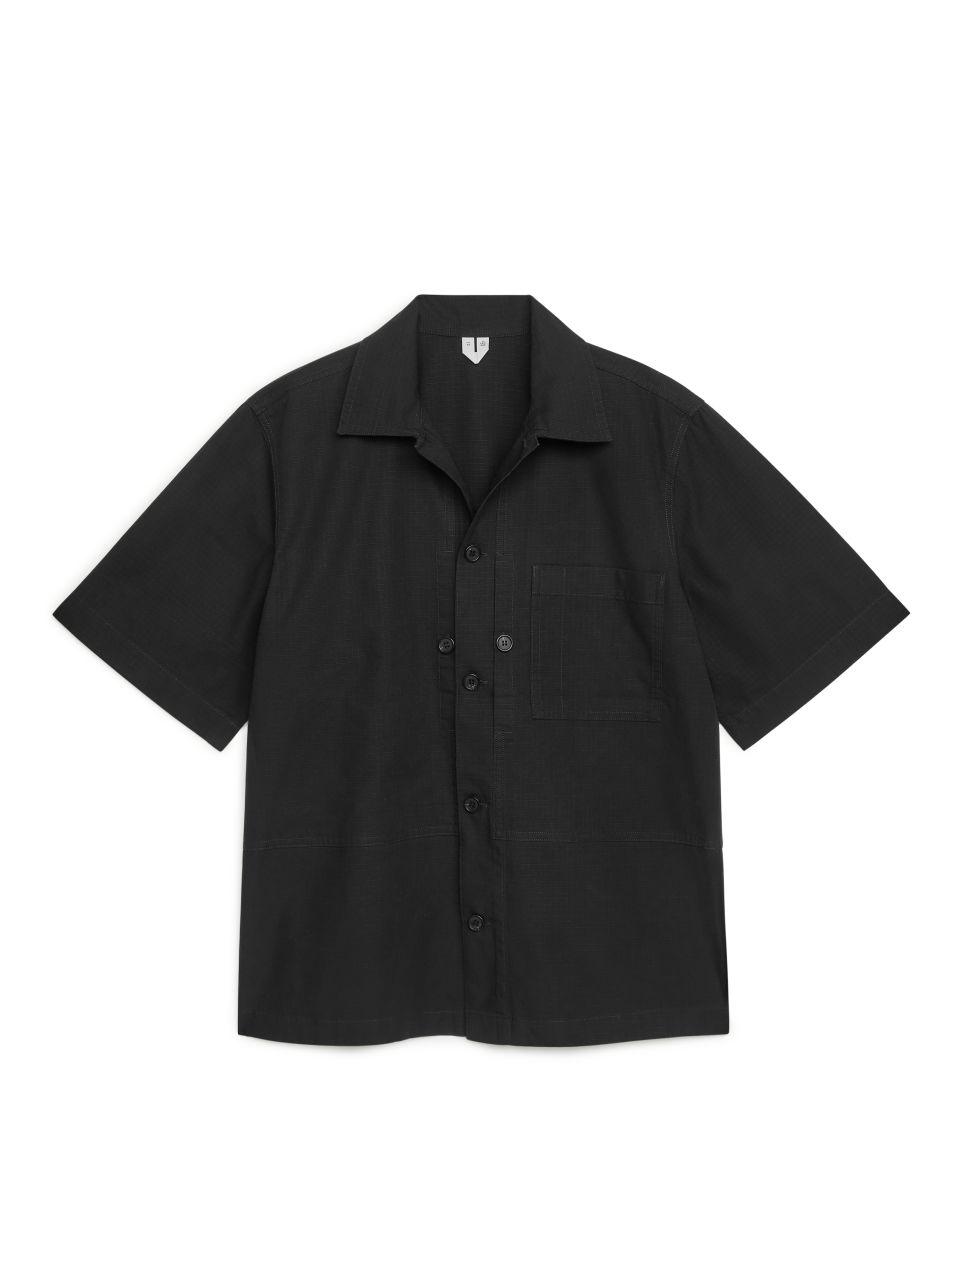 Short Sleeve Ripstop Overshirt - Black